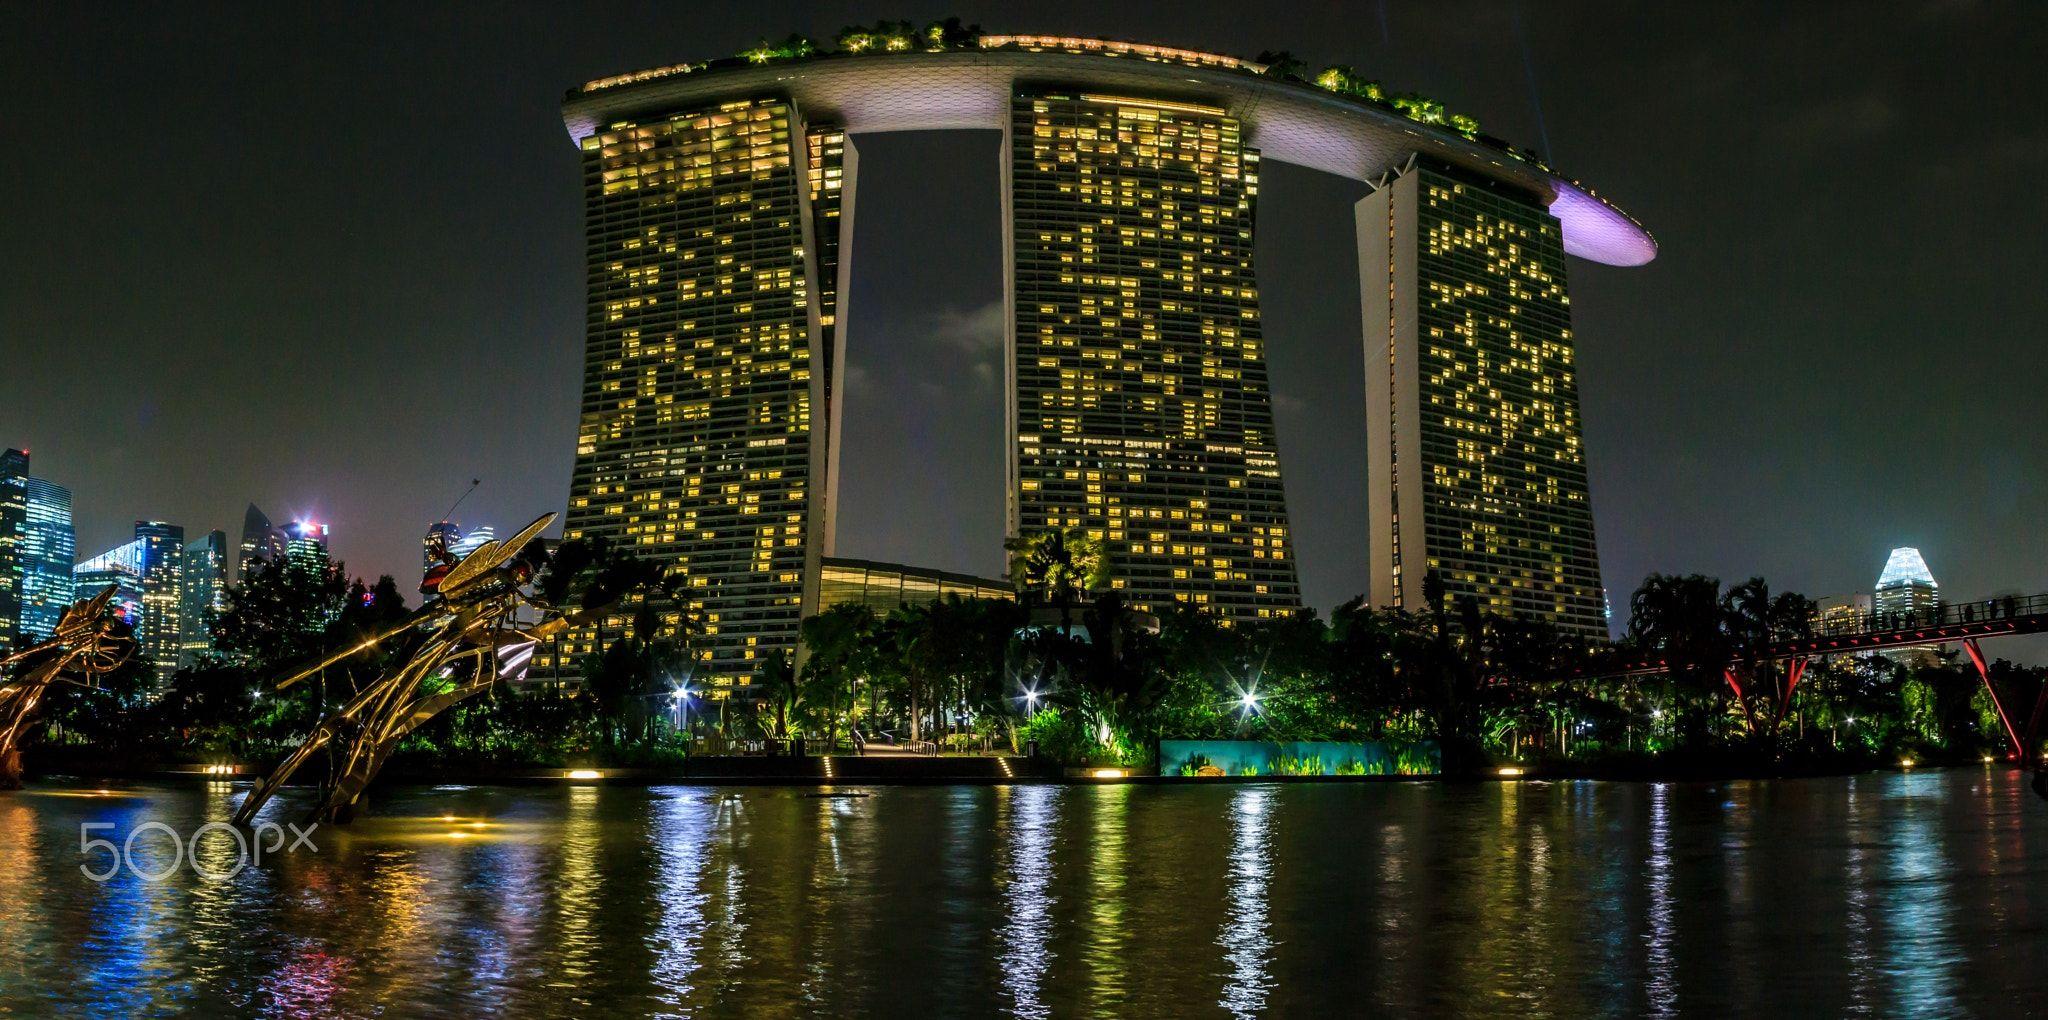 Marina Bay Sands Night Panorama - Marina Bay Sands Hotel, Singapore ...